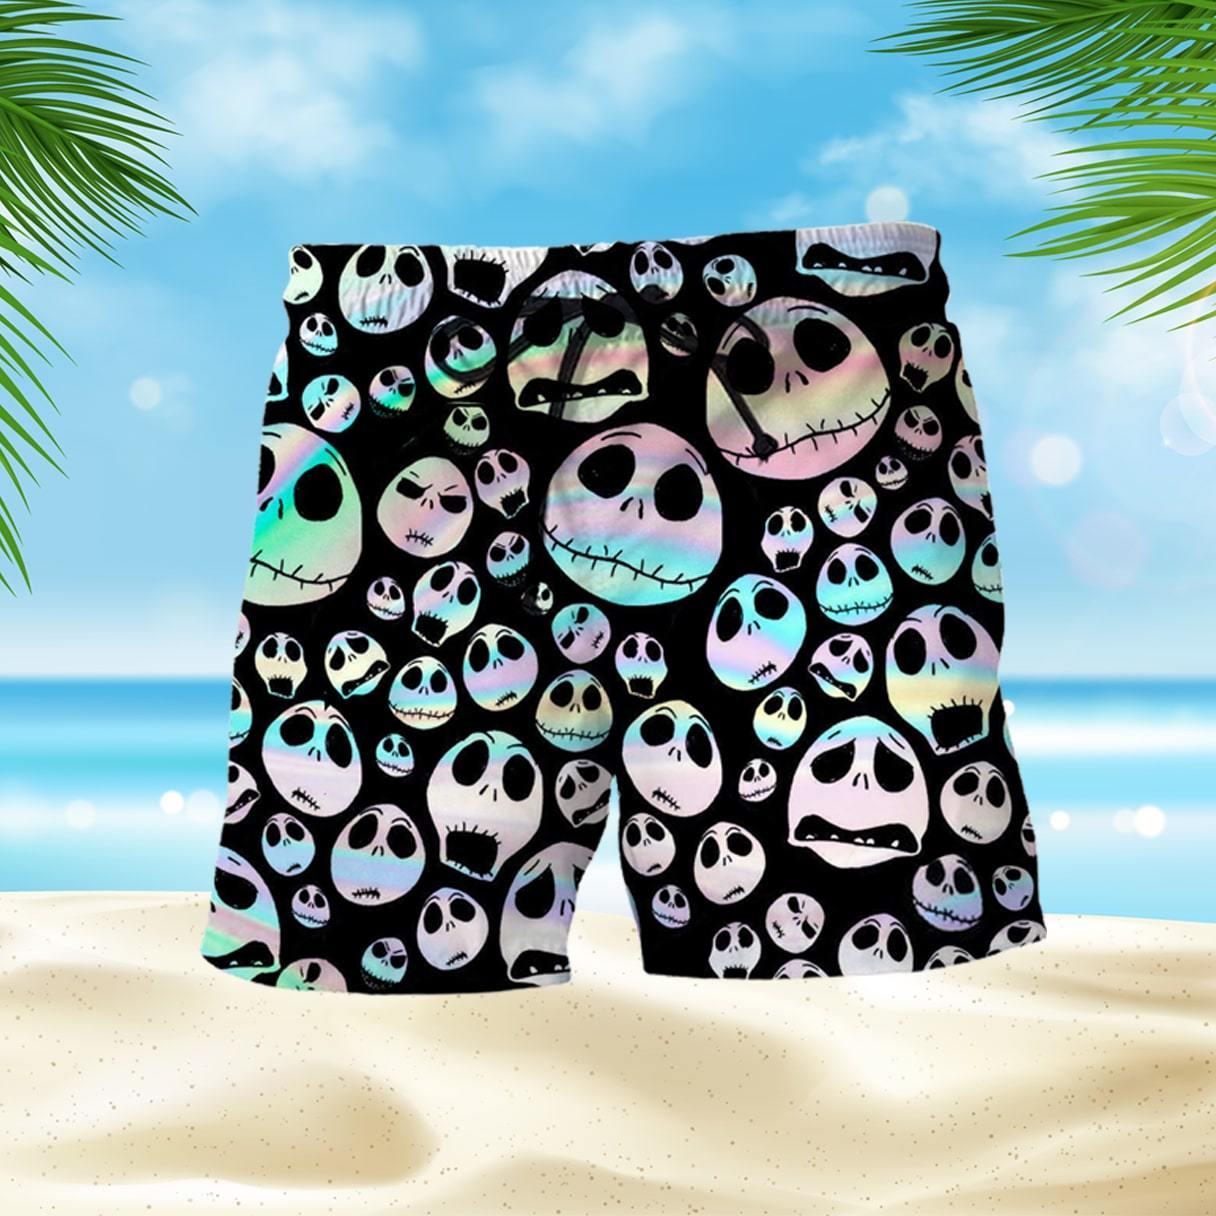 Hologram Jack Skellington Face Men Hawaiian Shirt Beach Shorts Set